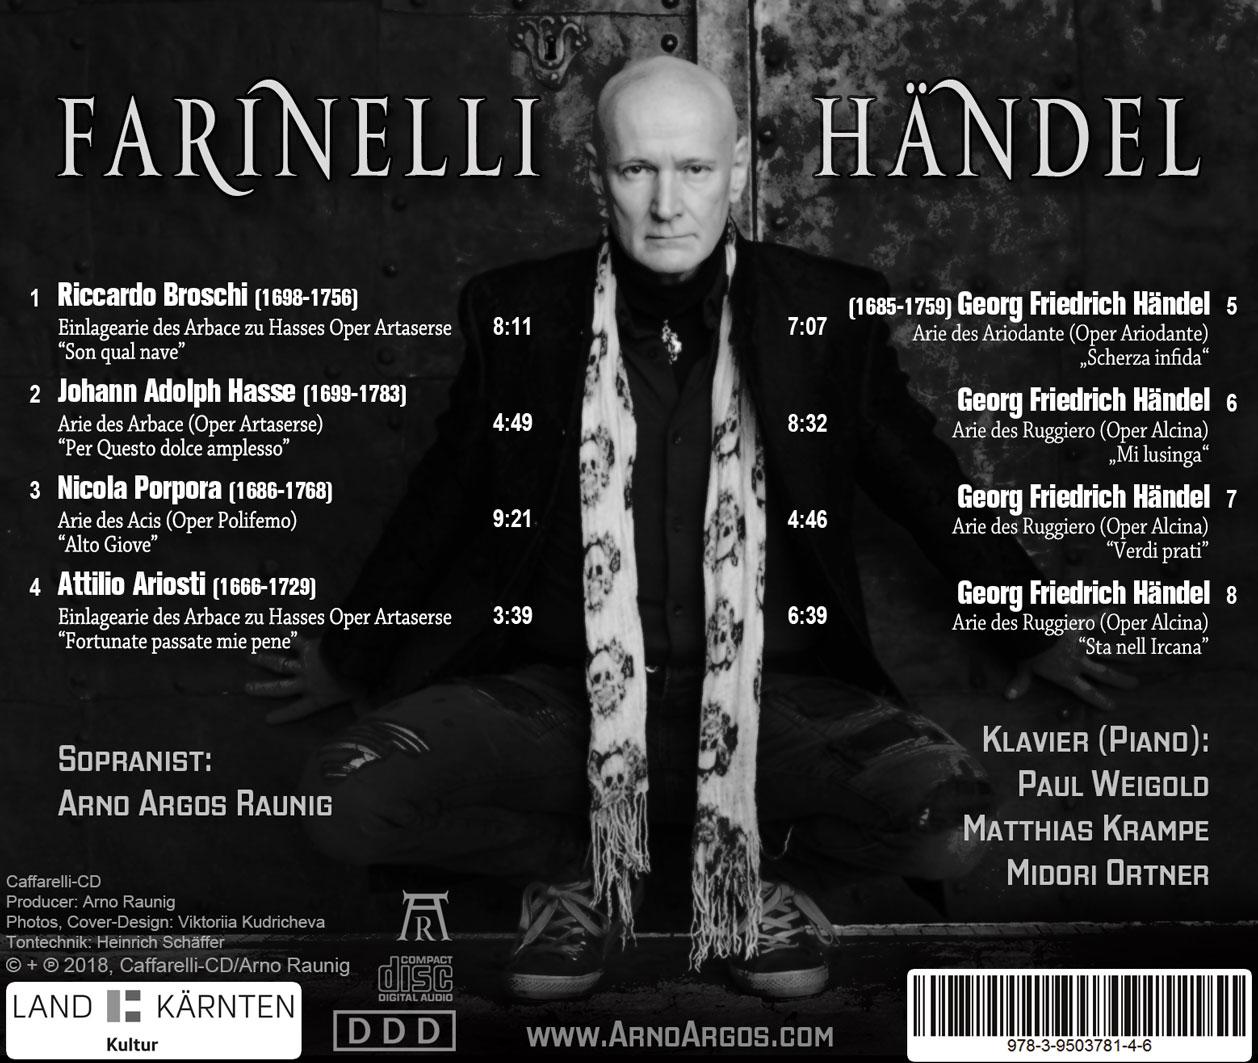 Album Farinelli vs Handel Sopranist Arno Argos Raunig